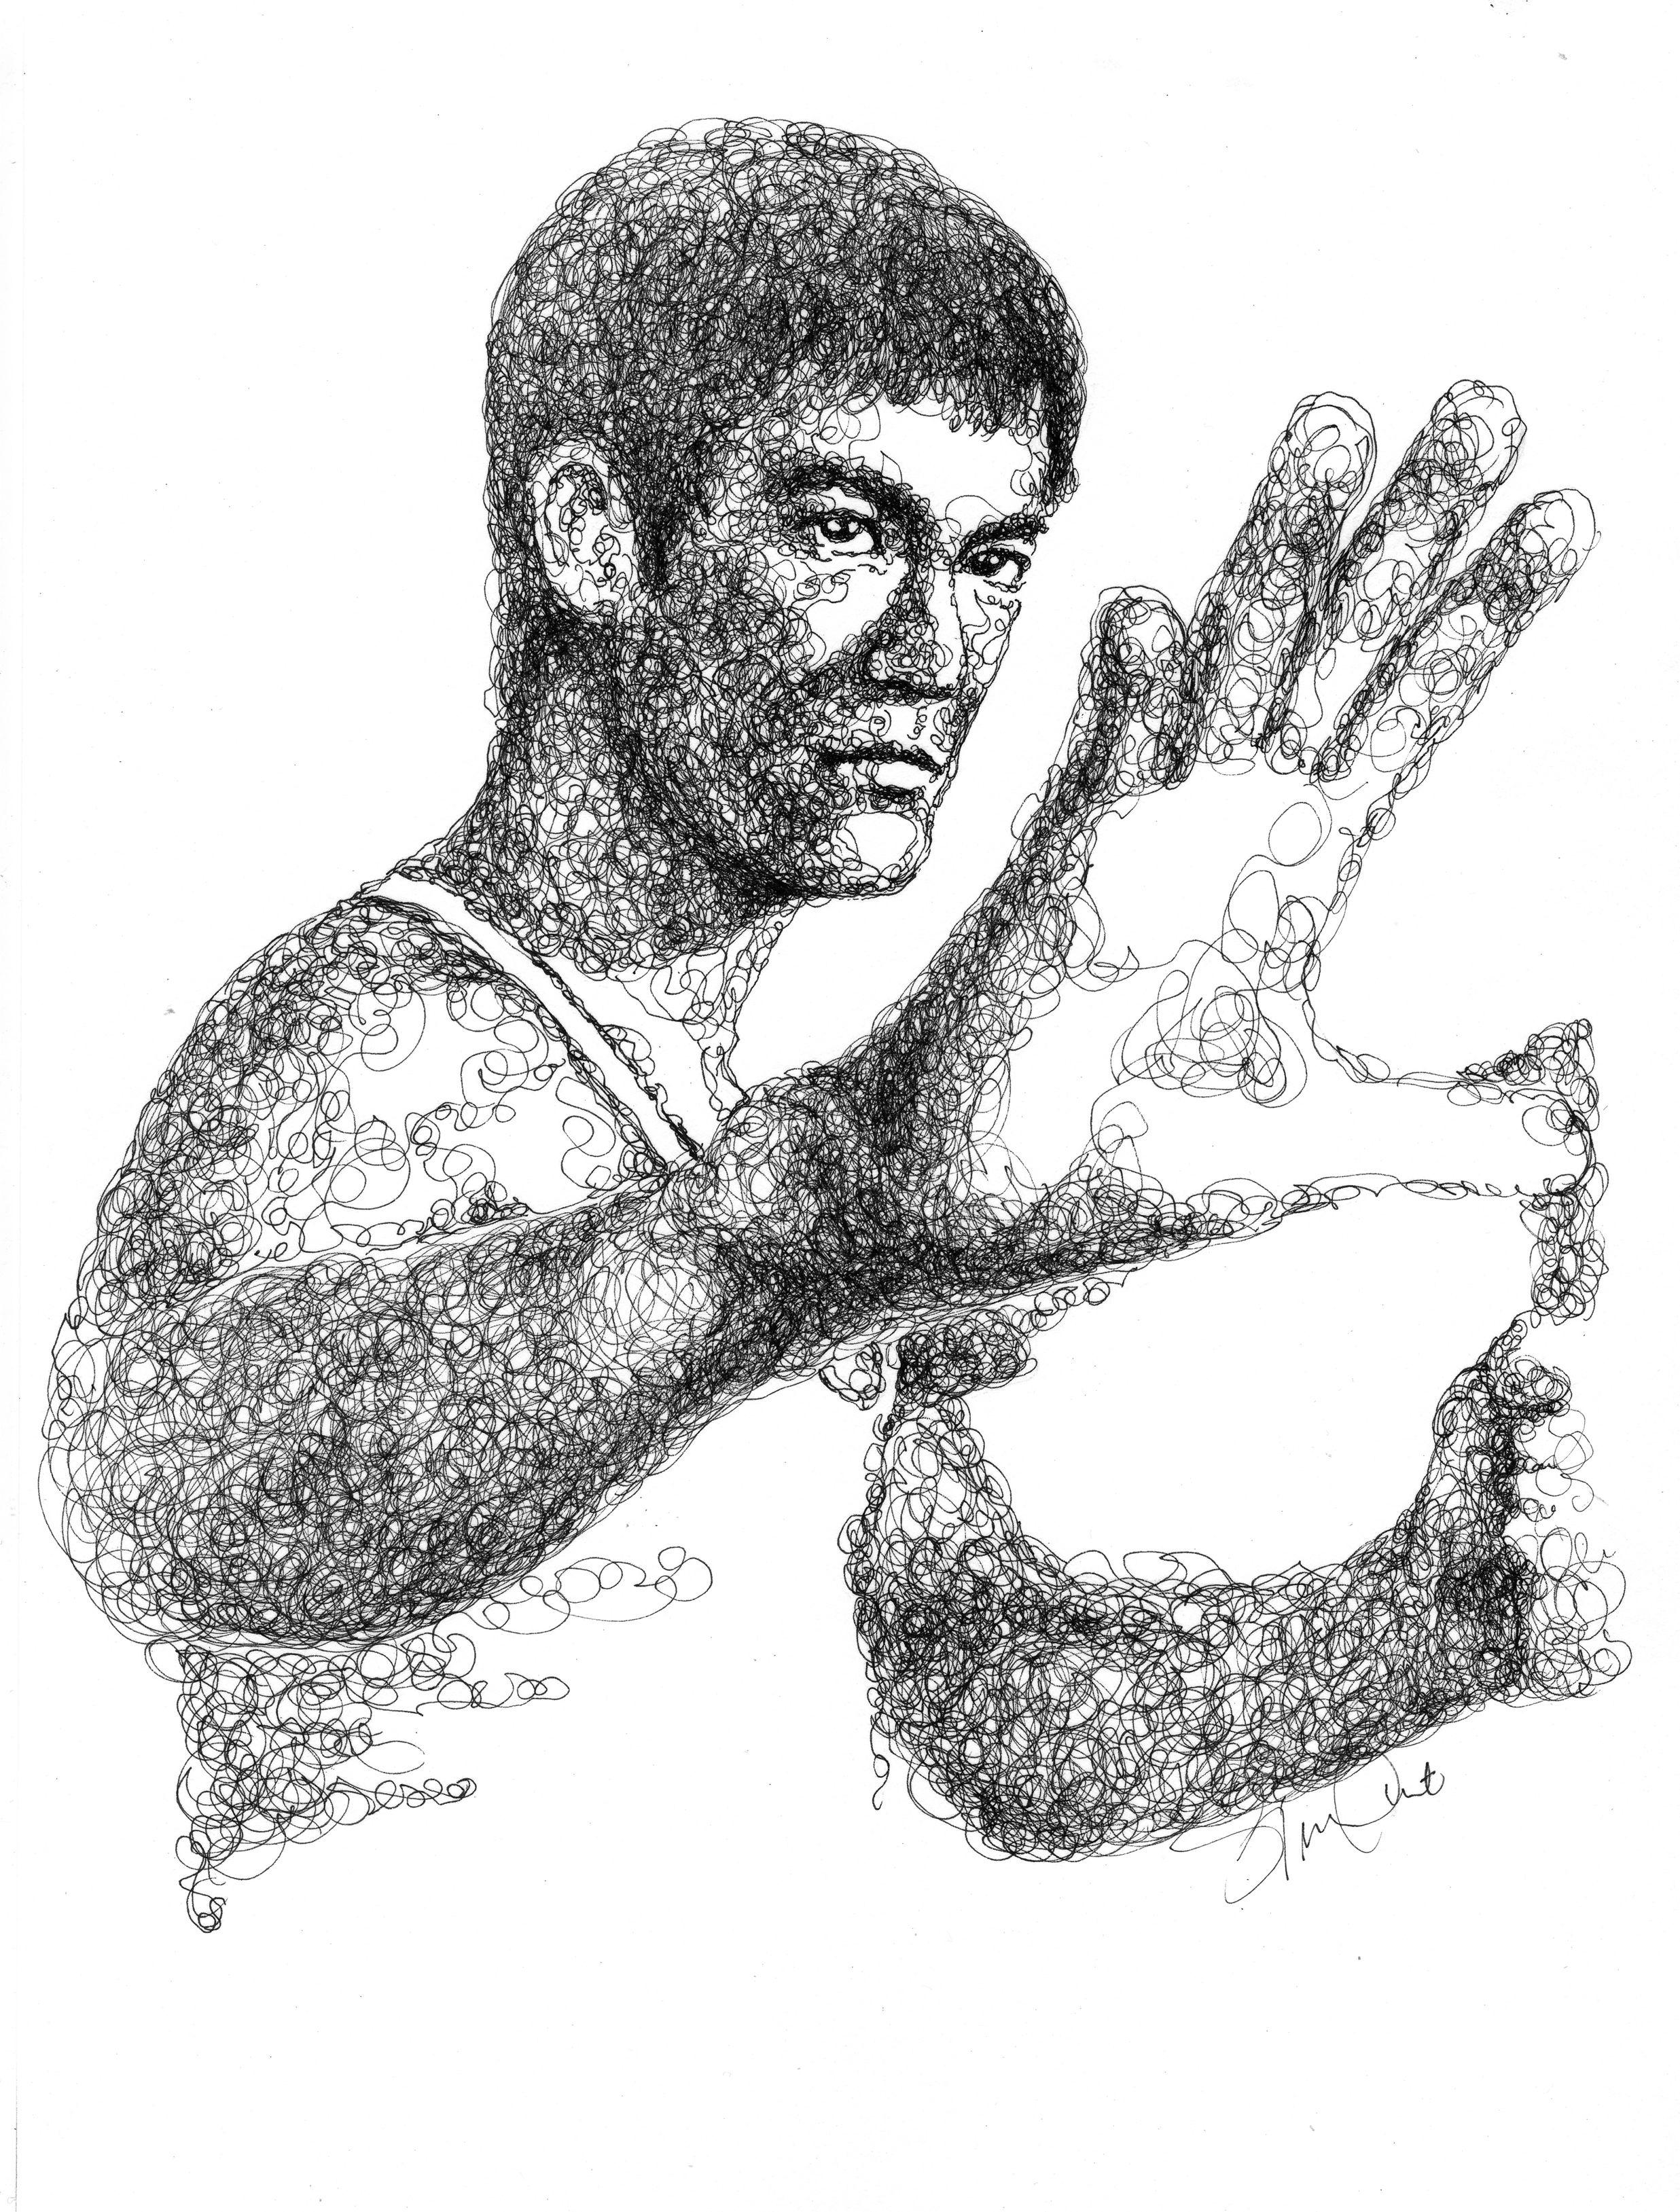 Bruce Lee Pen Ink Drawing Scribble Portrait Drawing By Sg Ong Bruce Lee Art Ink Pen Drawings Portrait Drawing